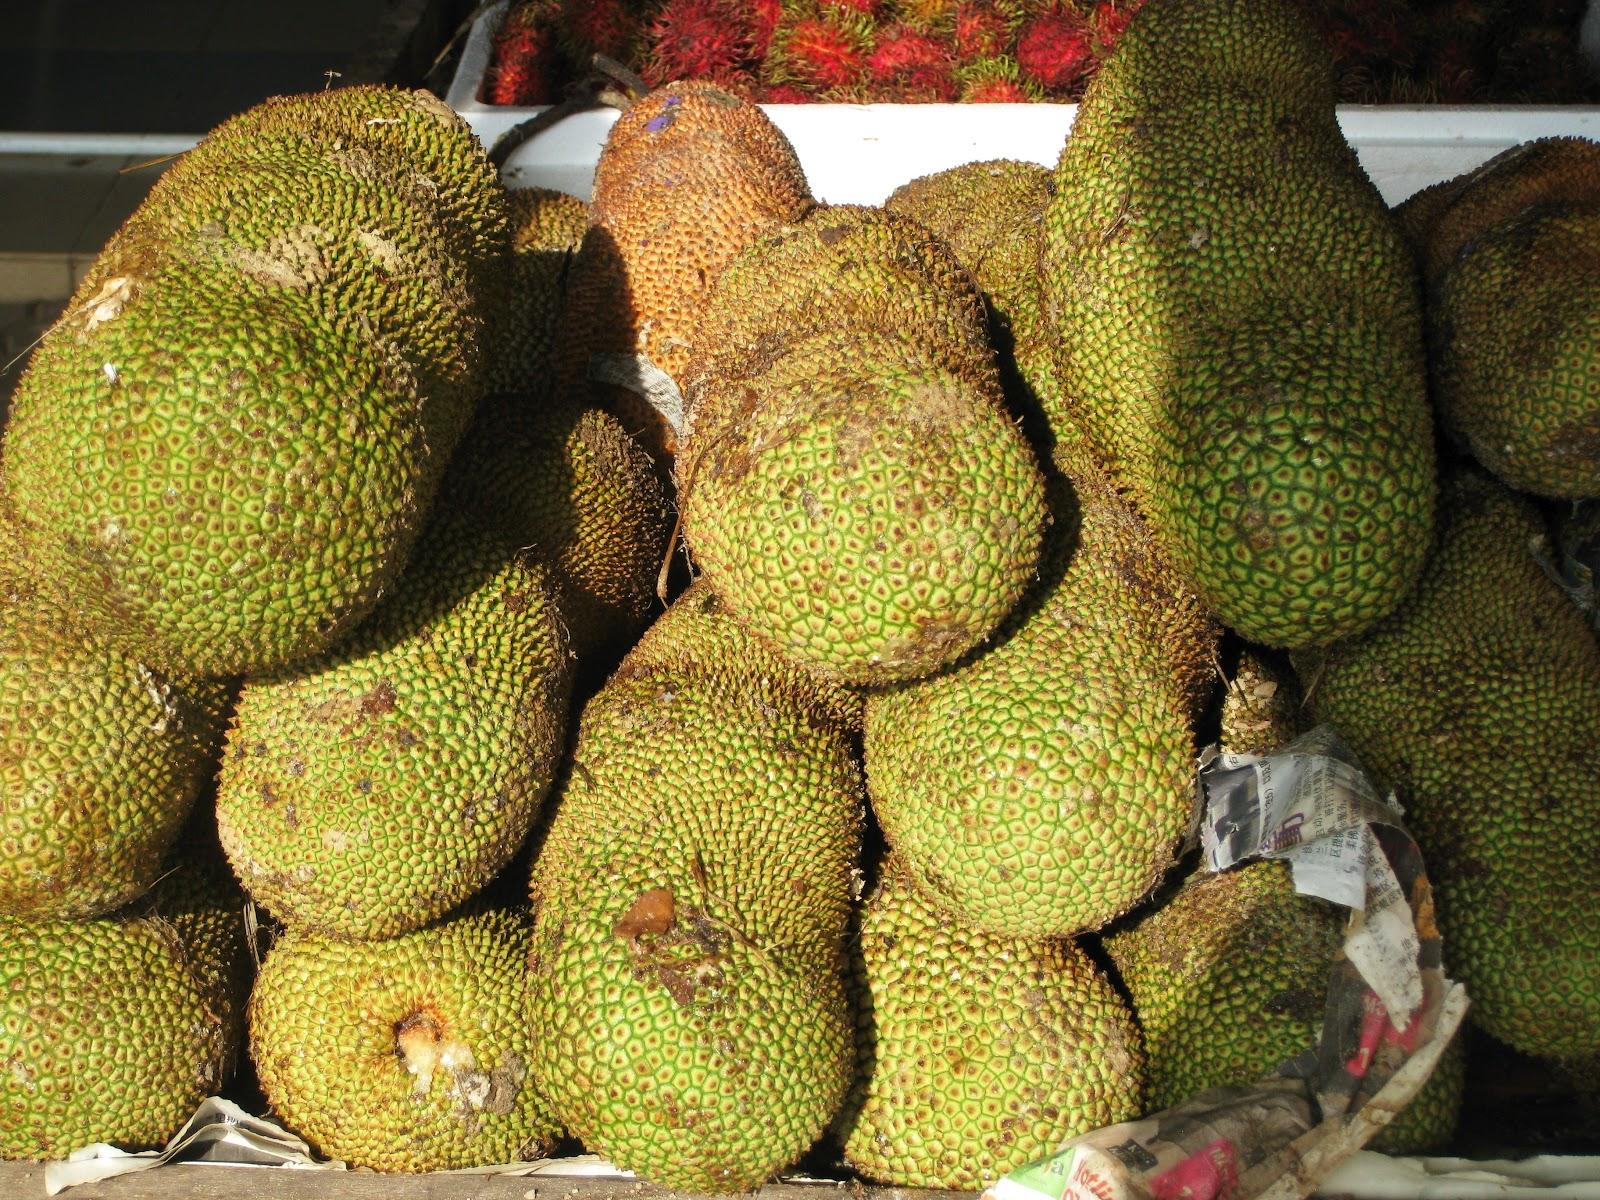 The Global Gamine: Durian Tasting